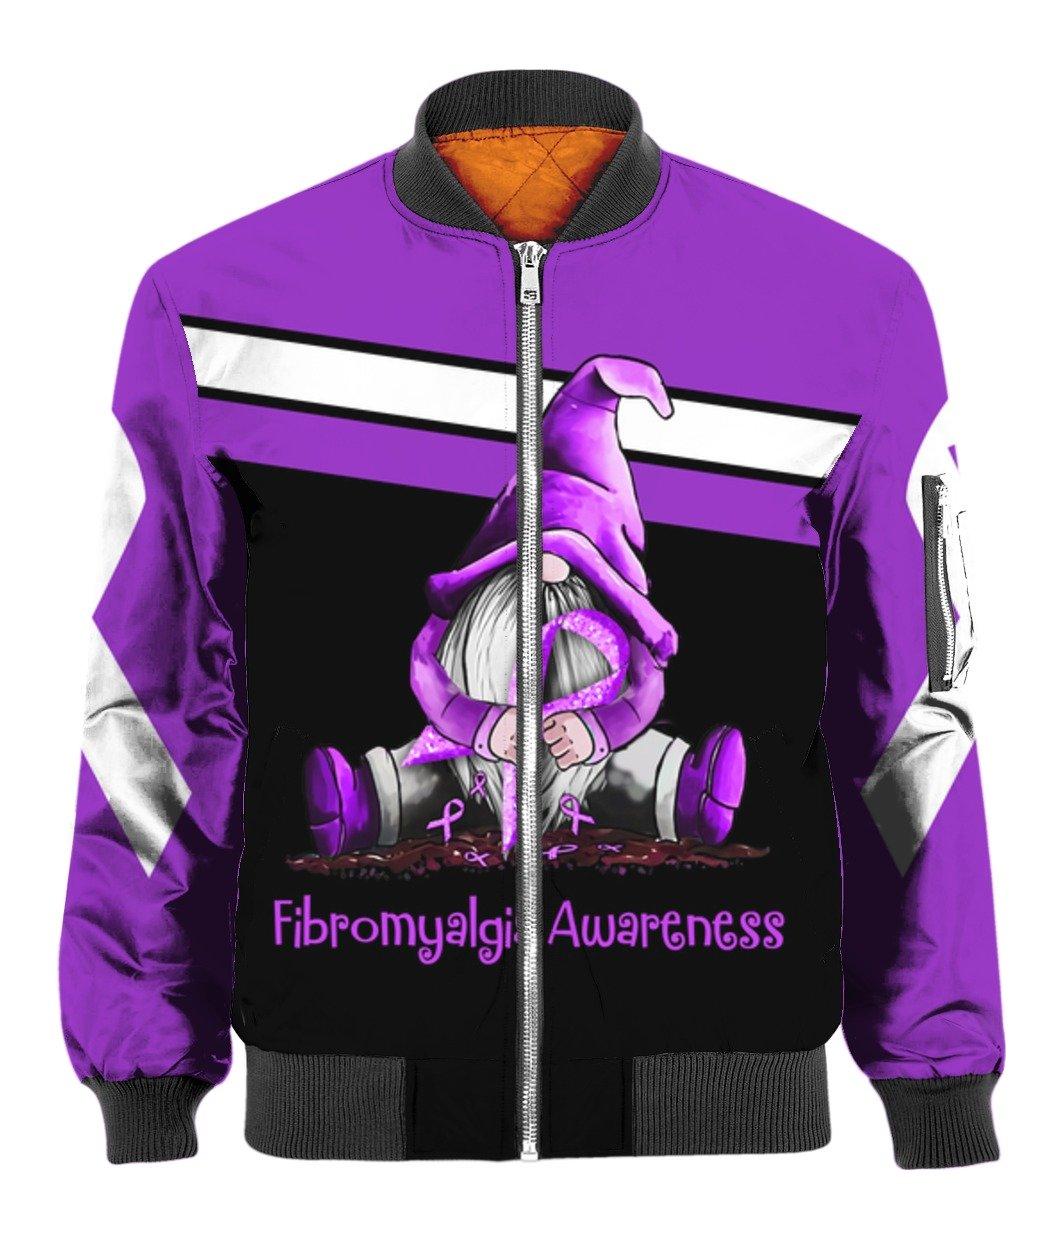 Gnome fibromyalgia awareness full printing bomber